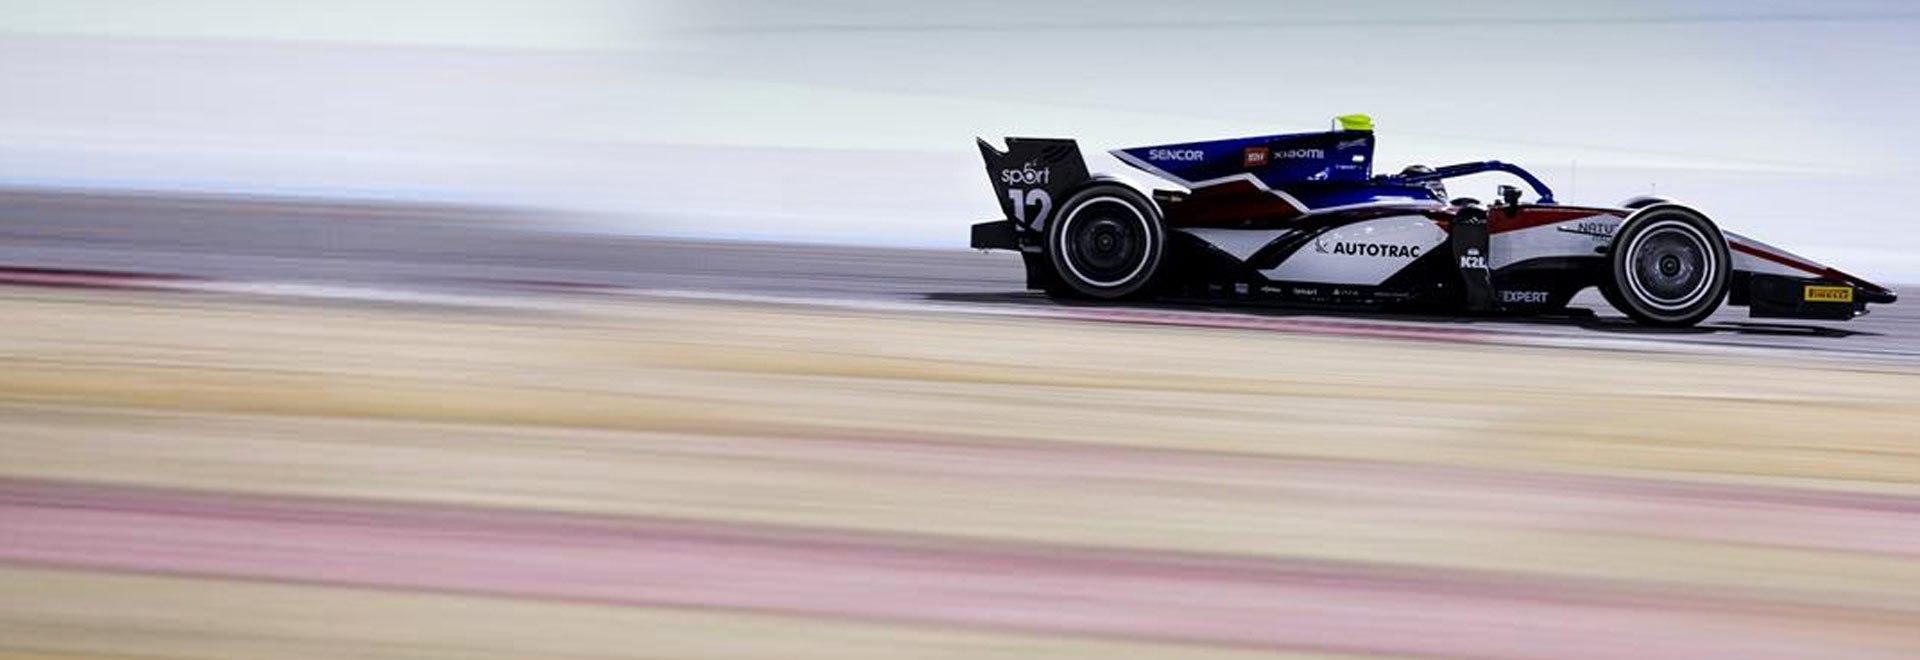 GP Austria. Qualifiche